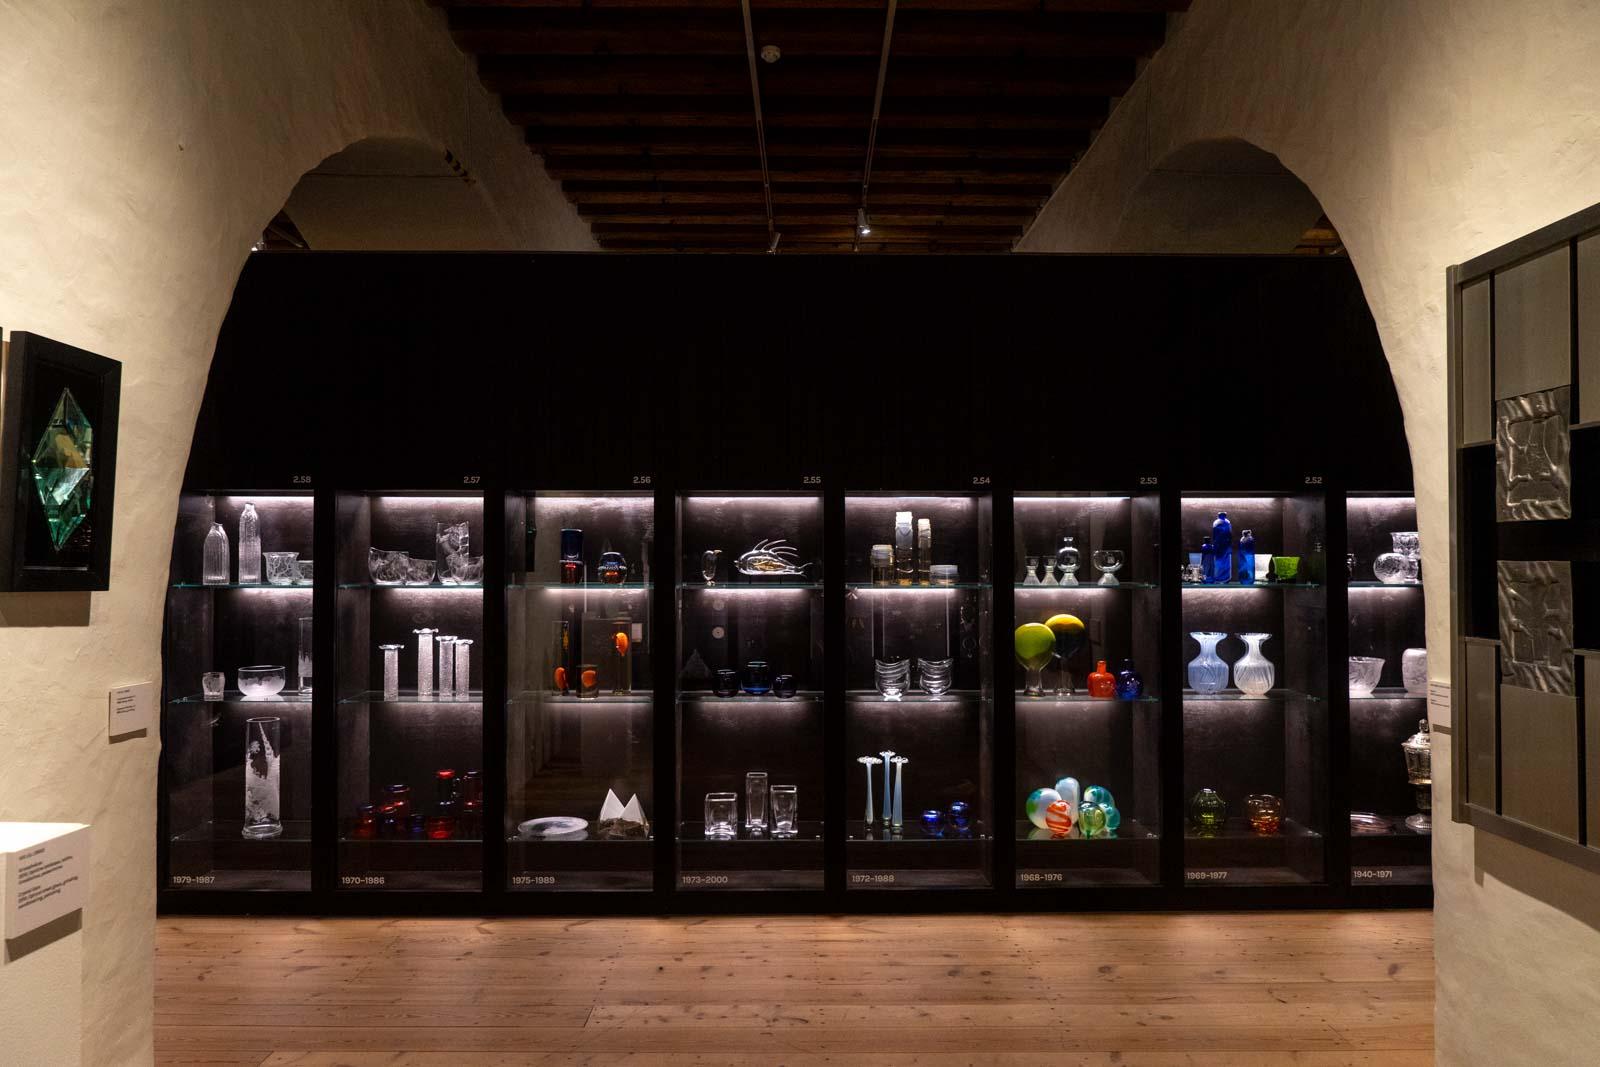 Estonian Museum of Applied Art and Design, Tallinn, Estonia